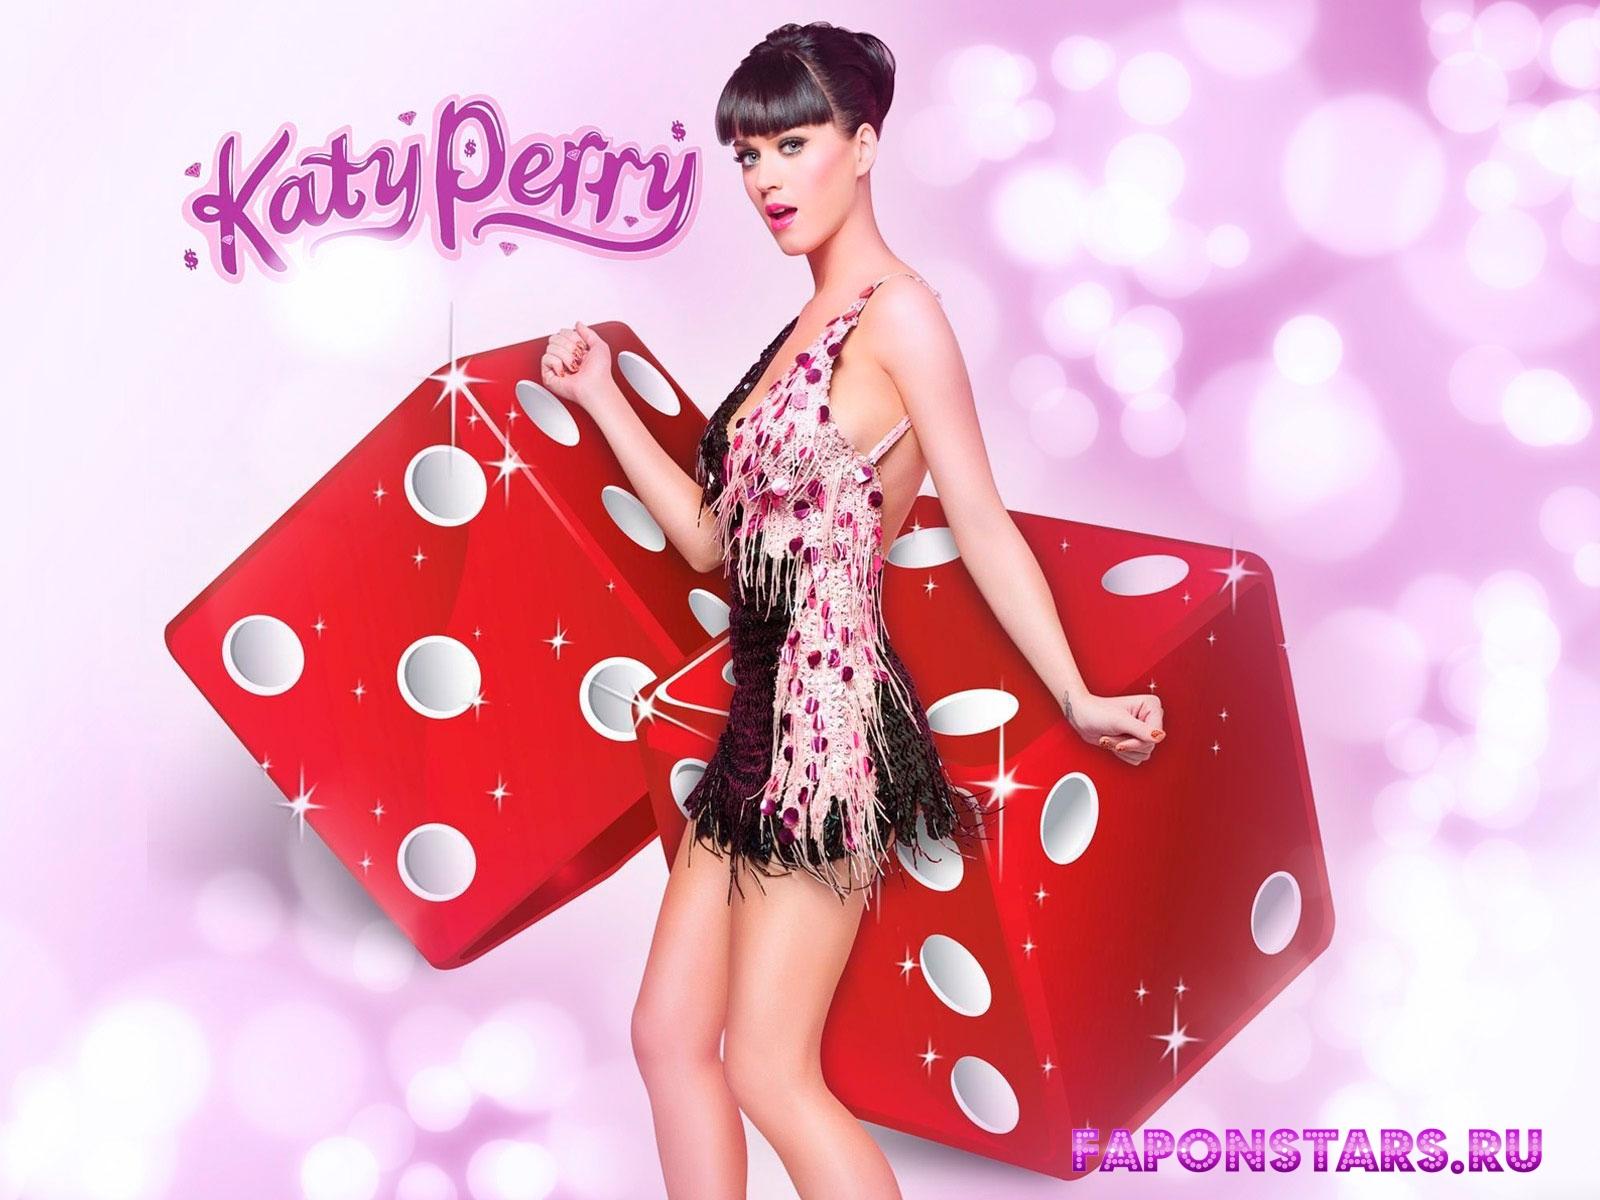 Katy Perry / Кэти Перри фото полуголая секси